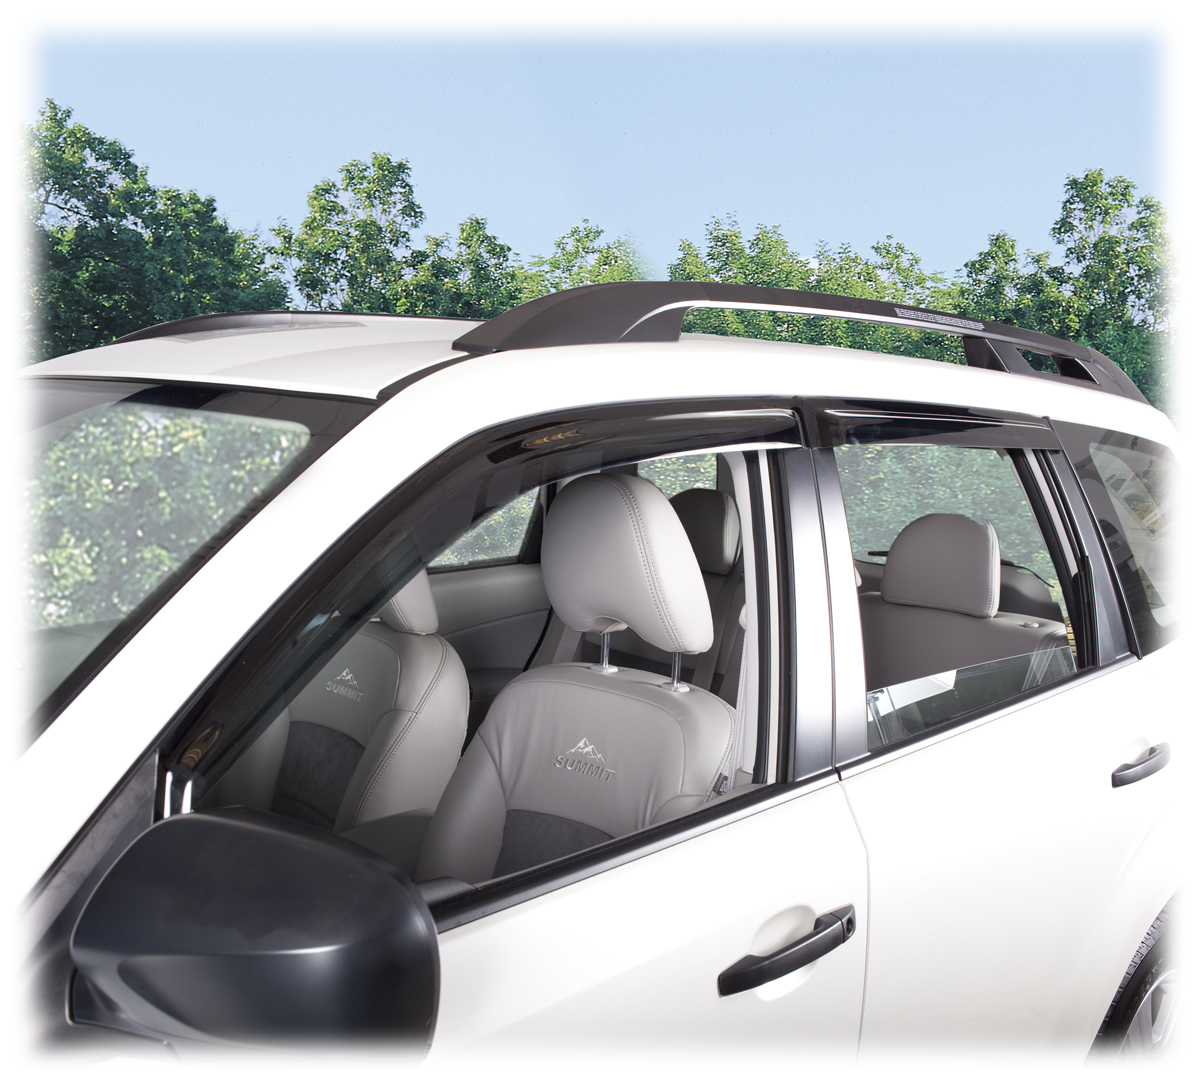 2014 15 16 17 18 Subaru Forester Window Visor Rain Guard